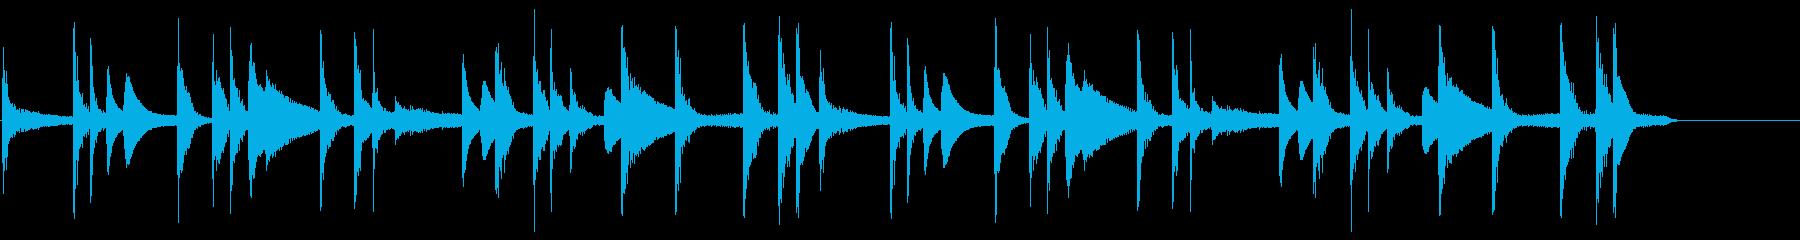 SYFIチャネルステーションIDに...の再生済みの波形